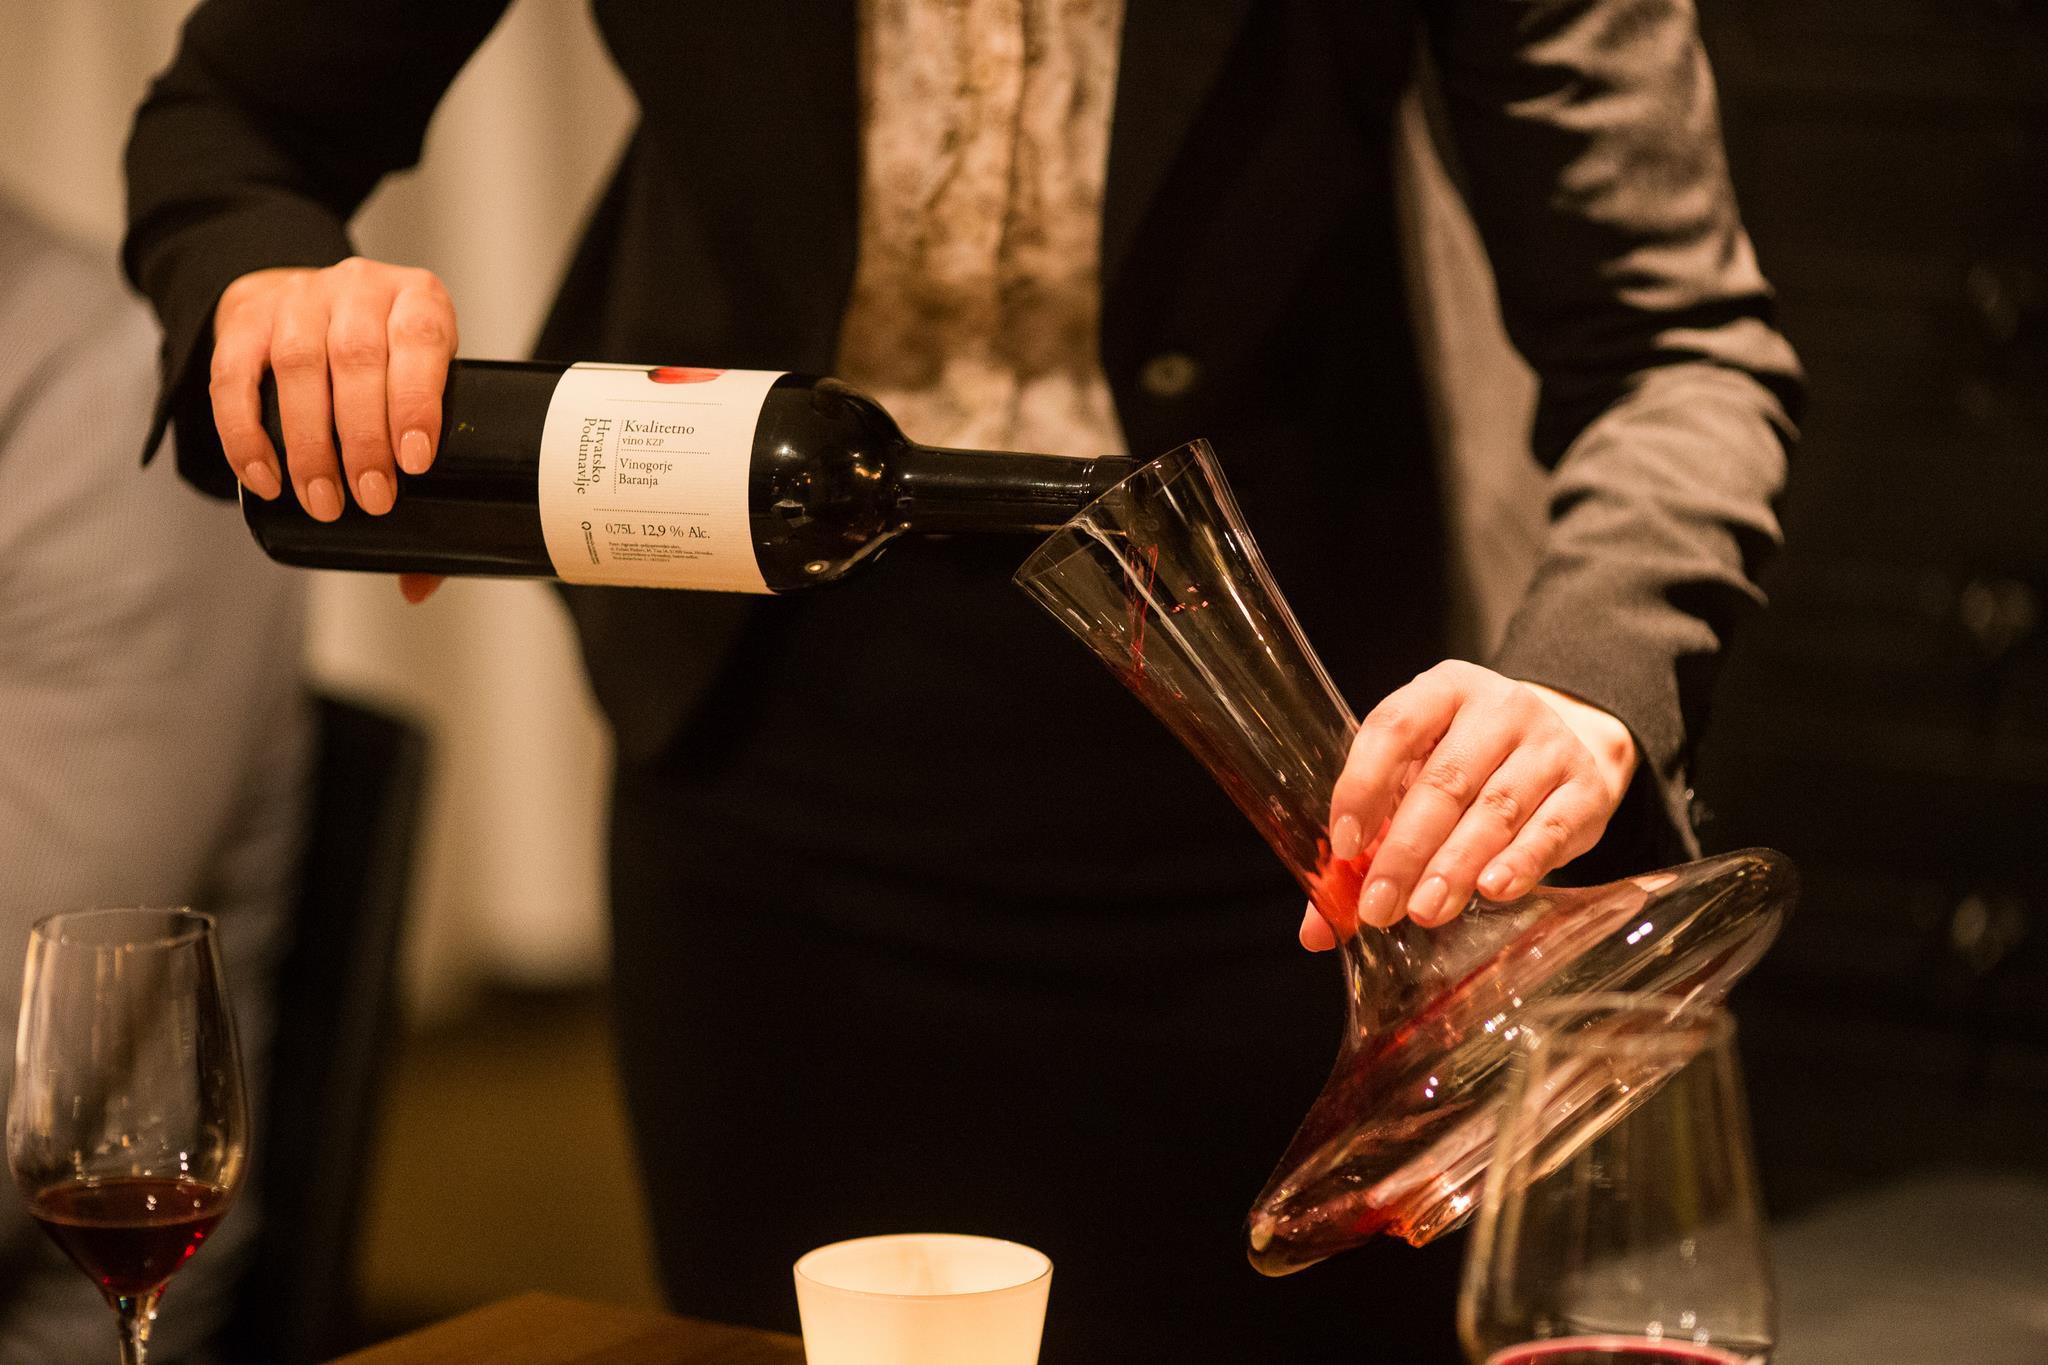 Prvi susret s vinom - vinska škola